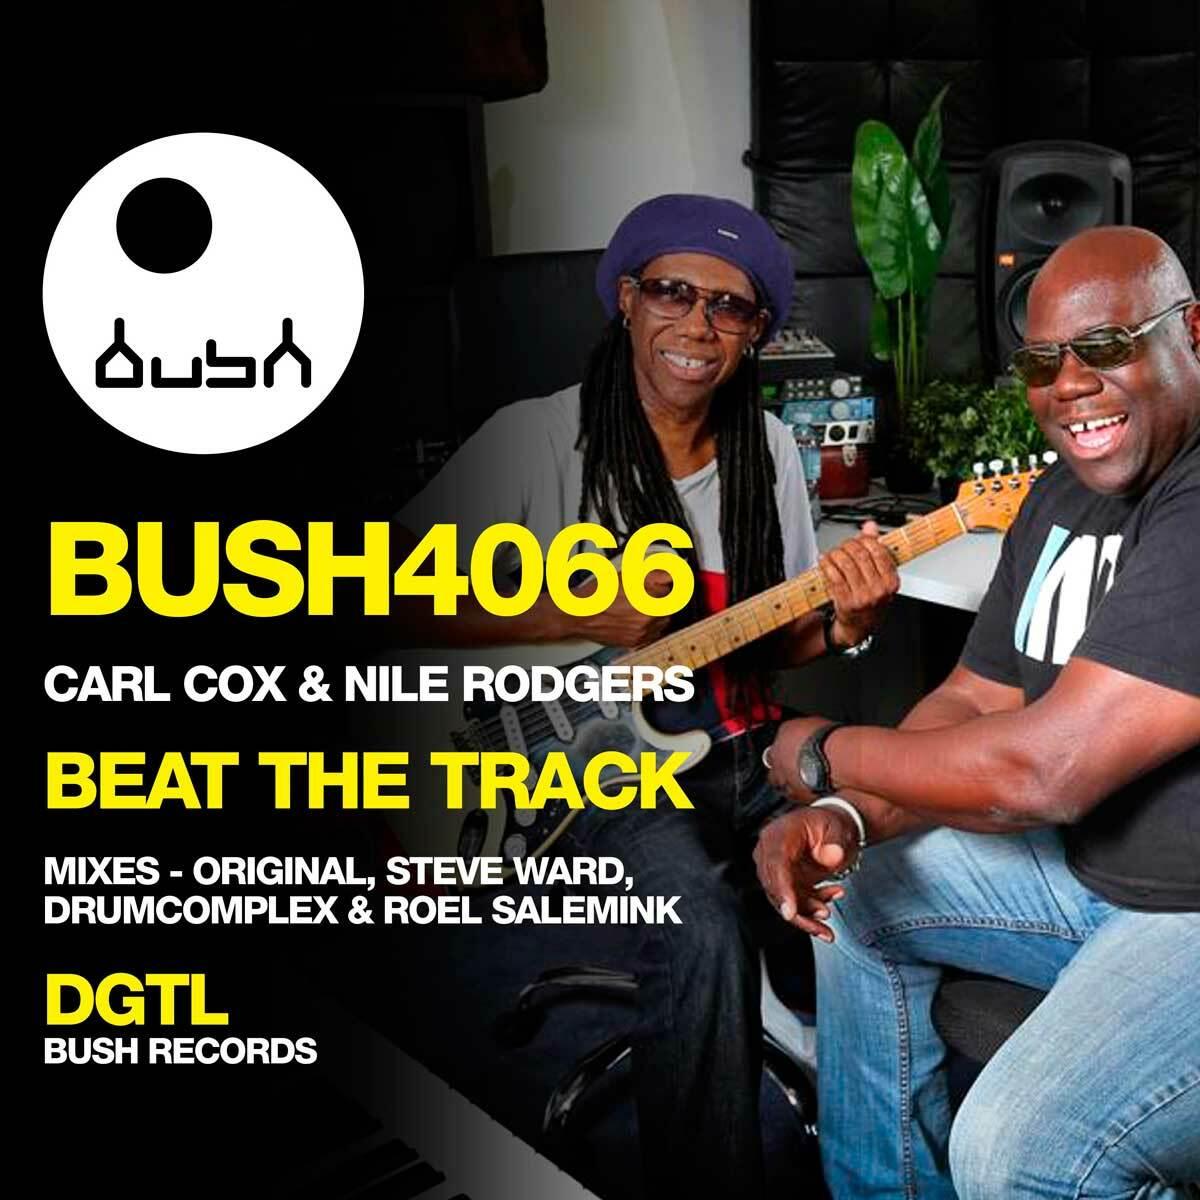 Carl Cox & Nile Rodgers – Beat The Track (Bush Records)